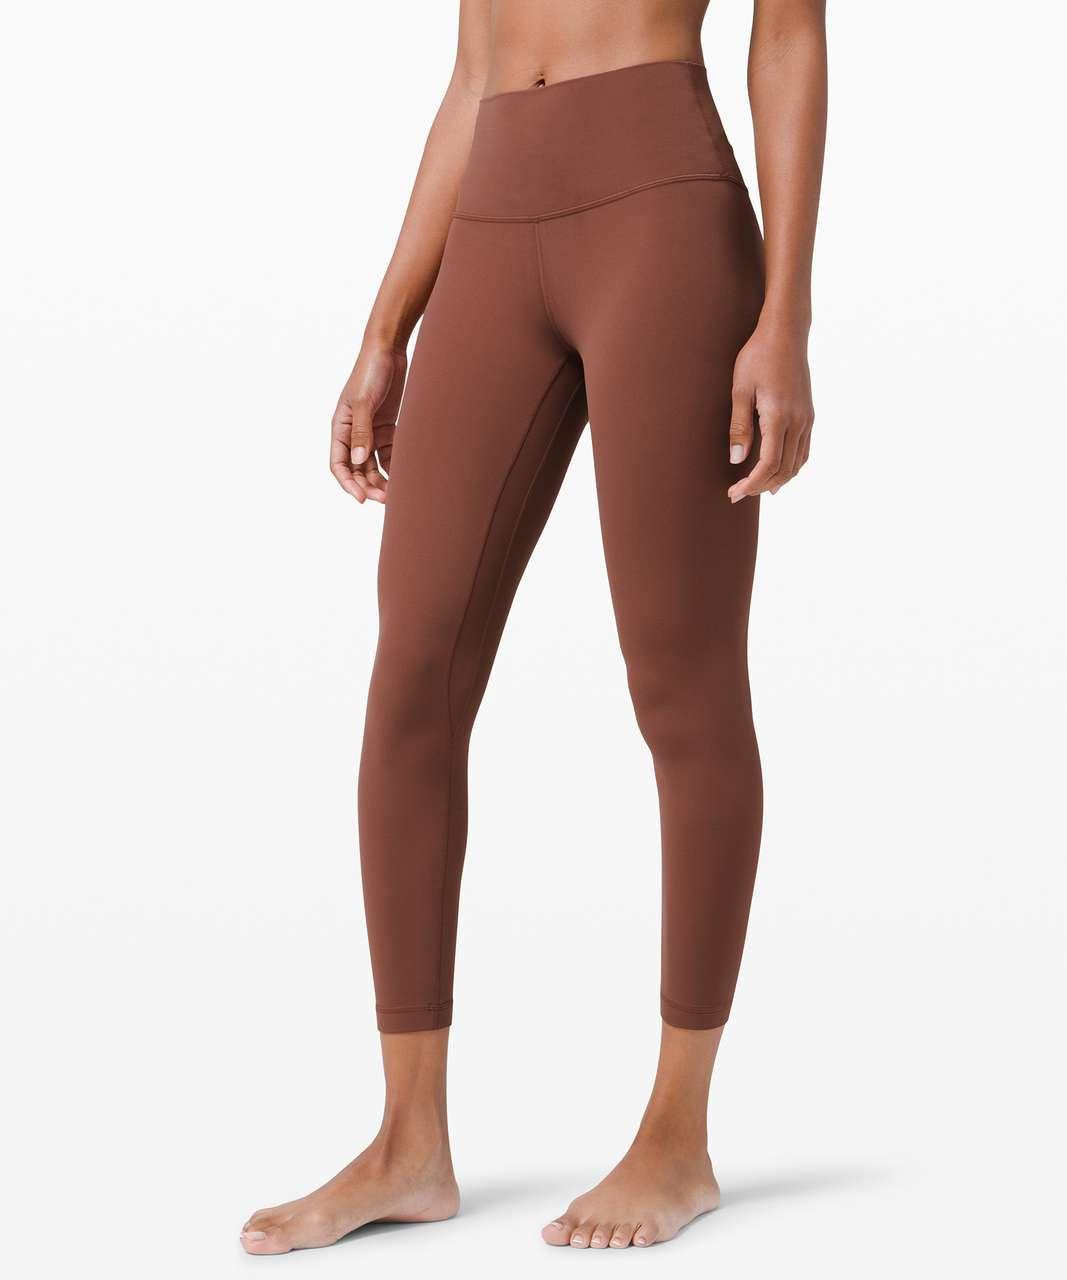 "Lululemon Align Pant II 25"" - Ancient Copper"